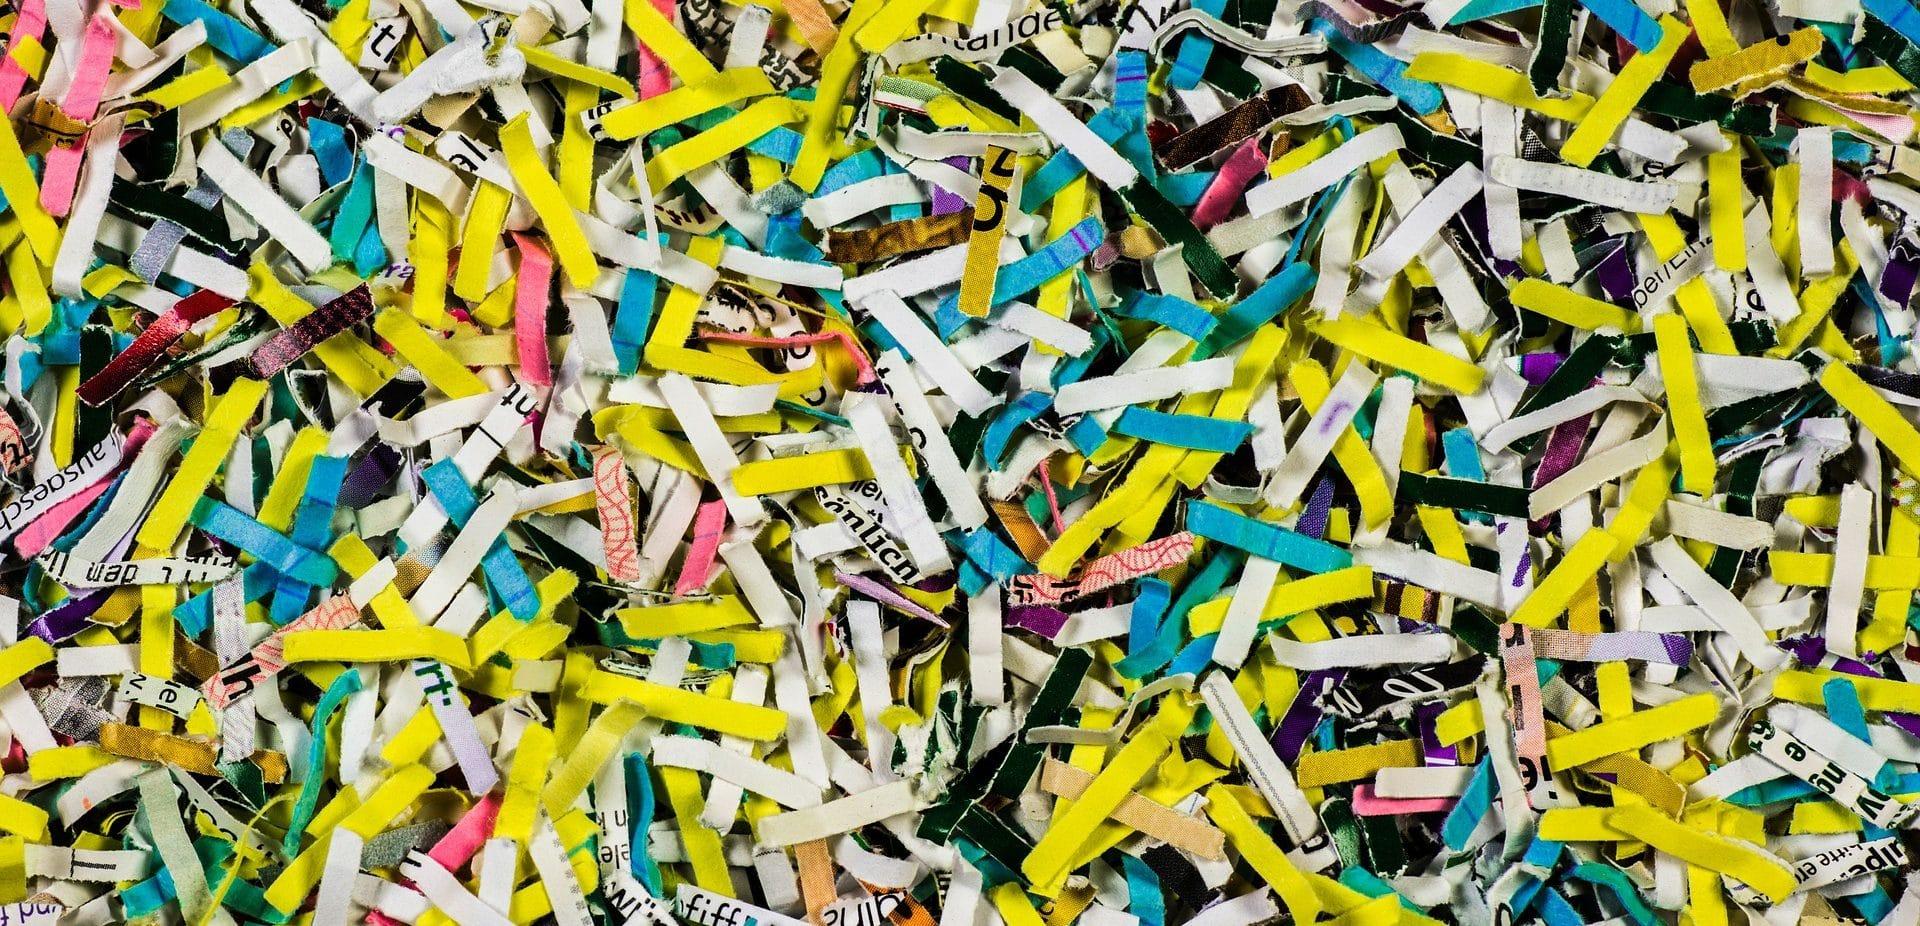 shredding process